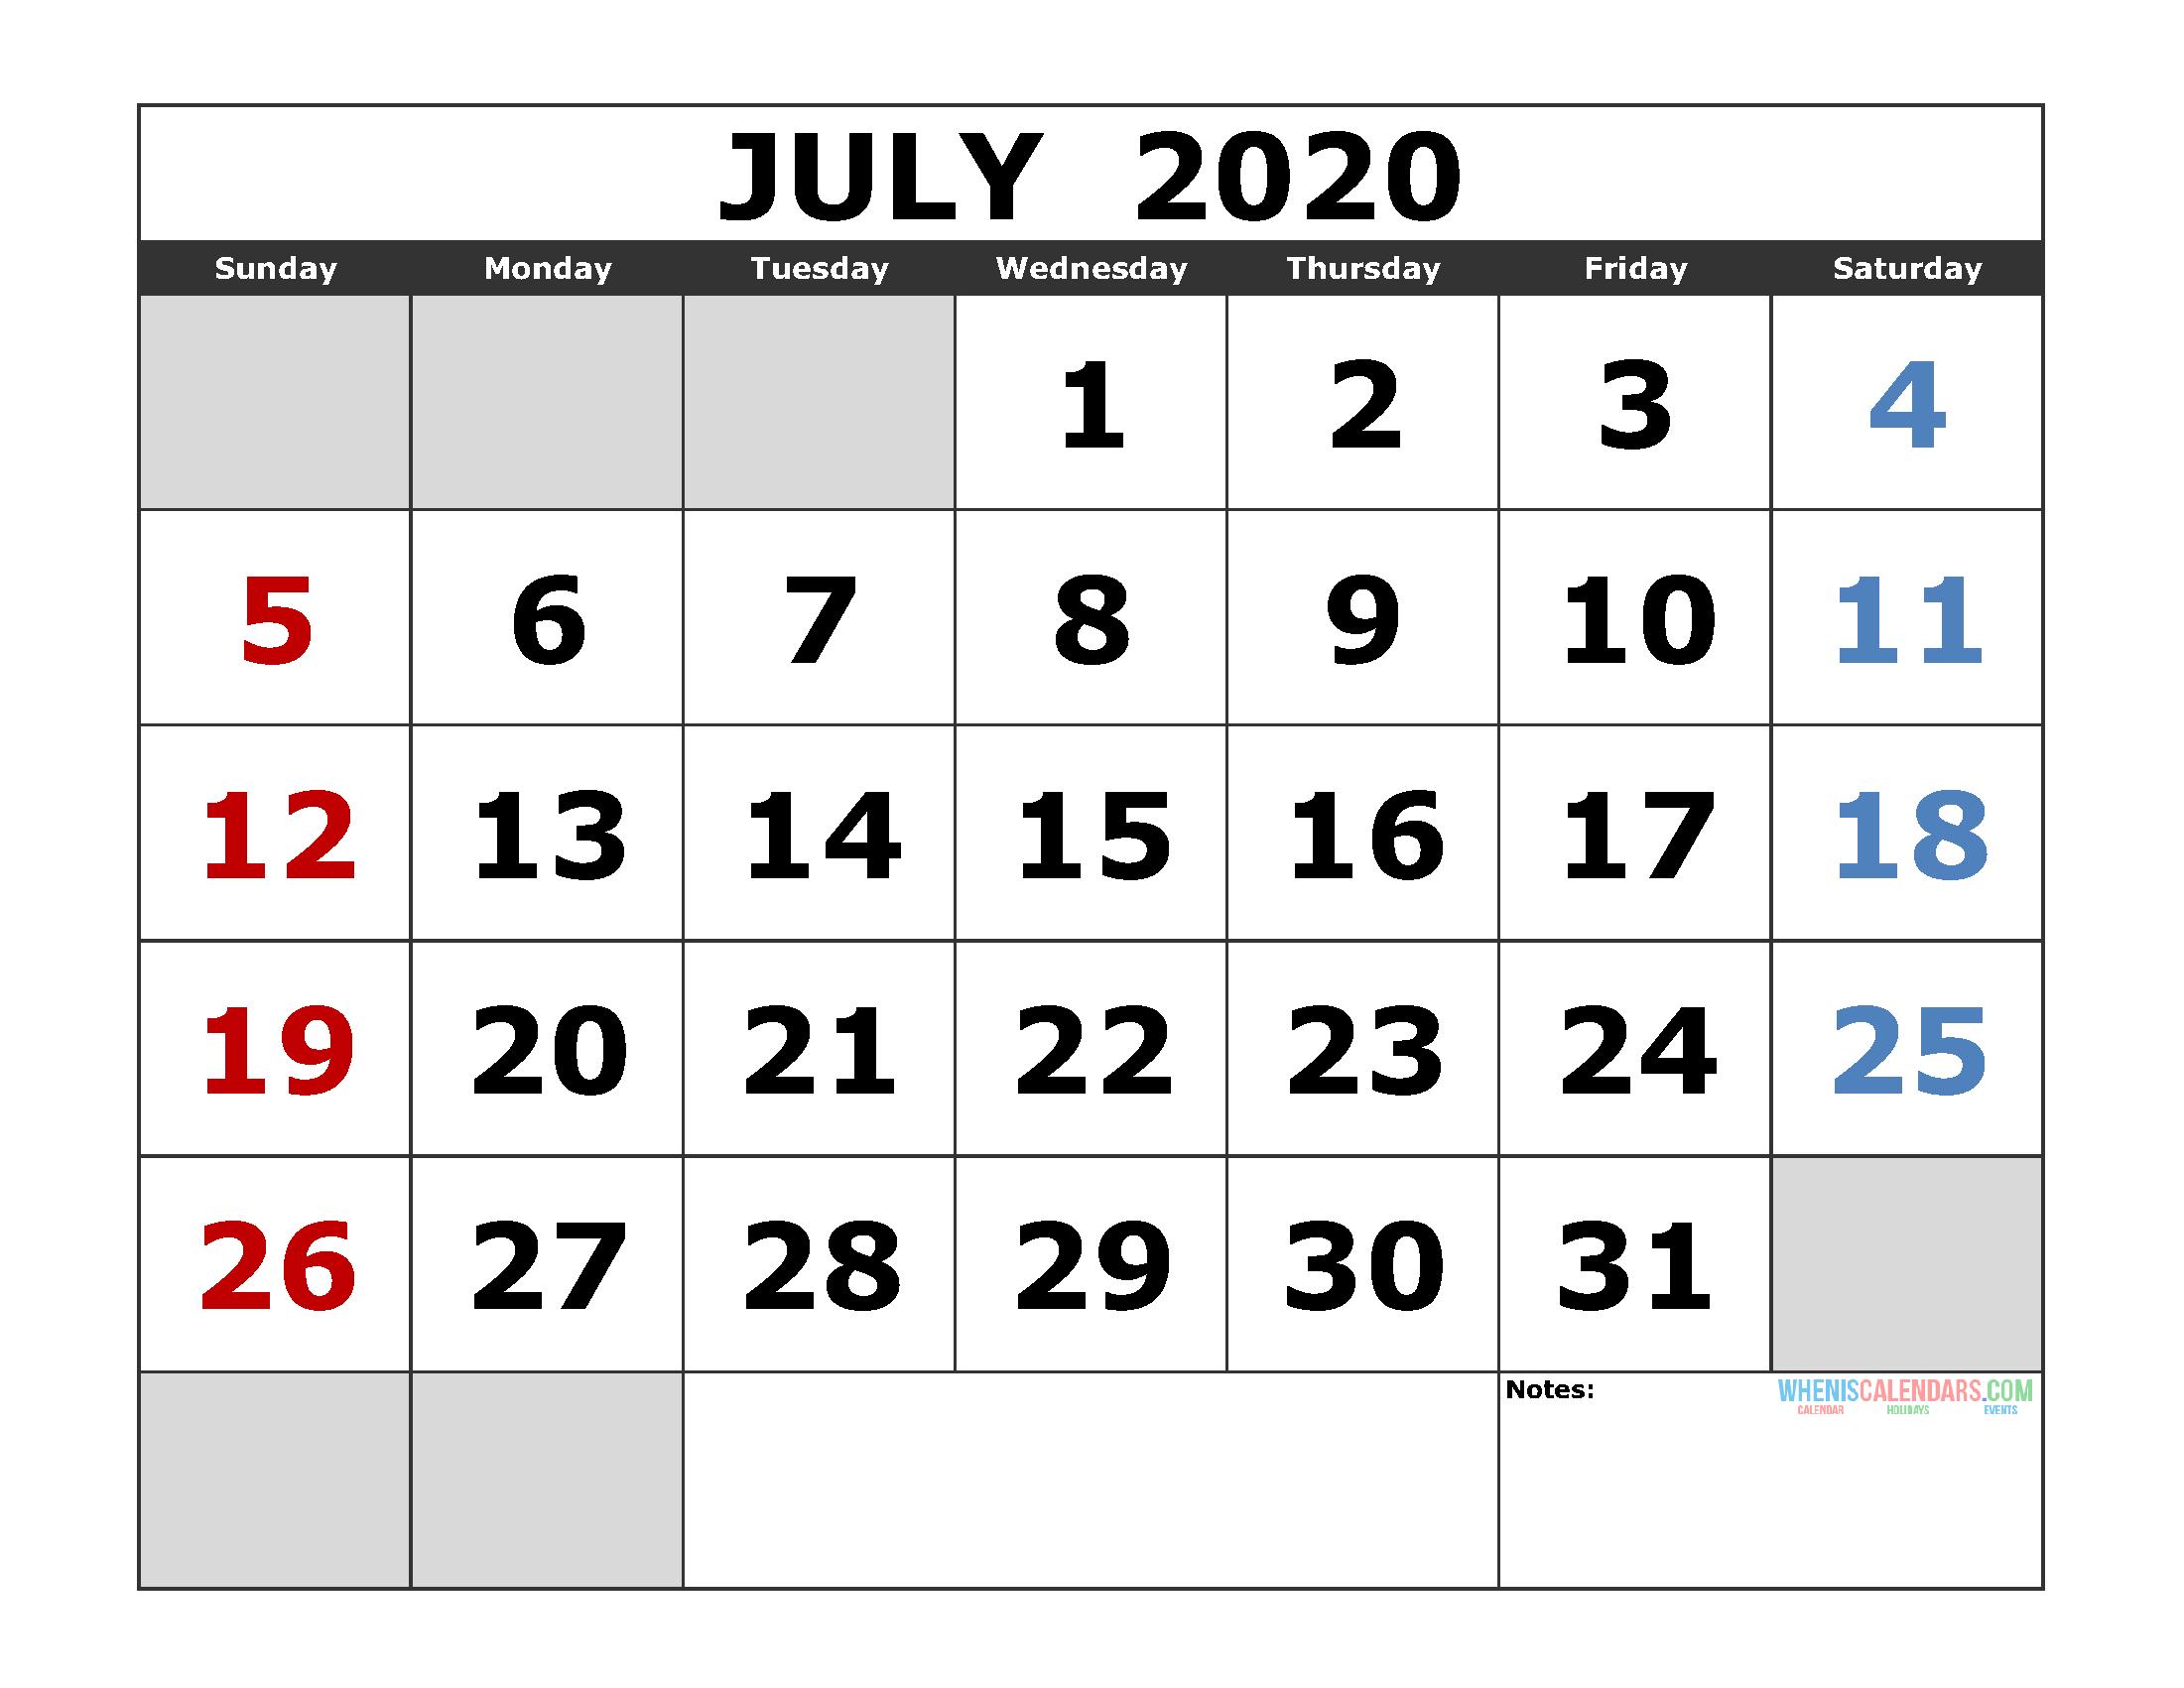 Fillable July 2020 Calendar Template